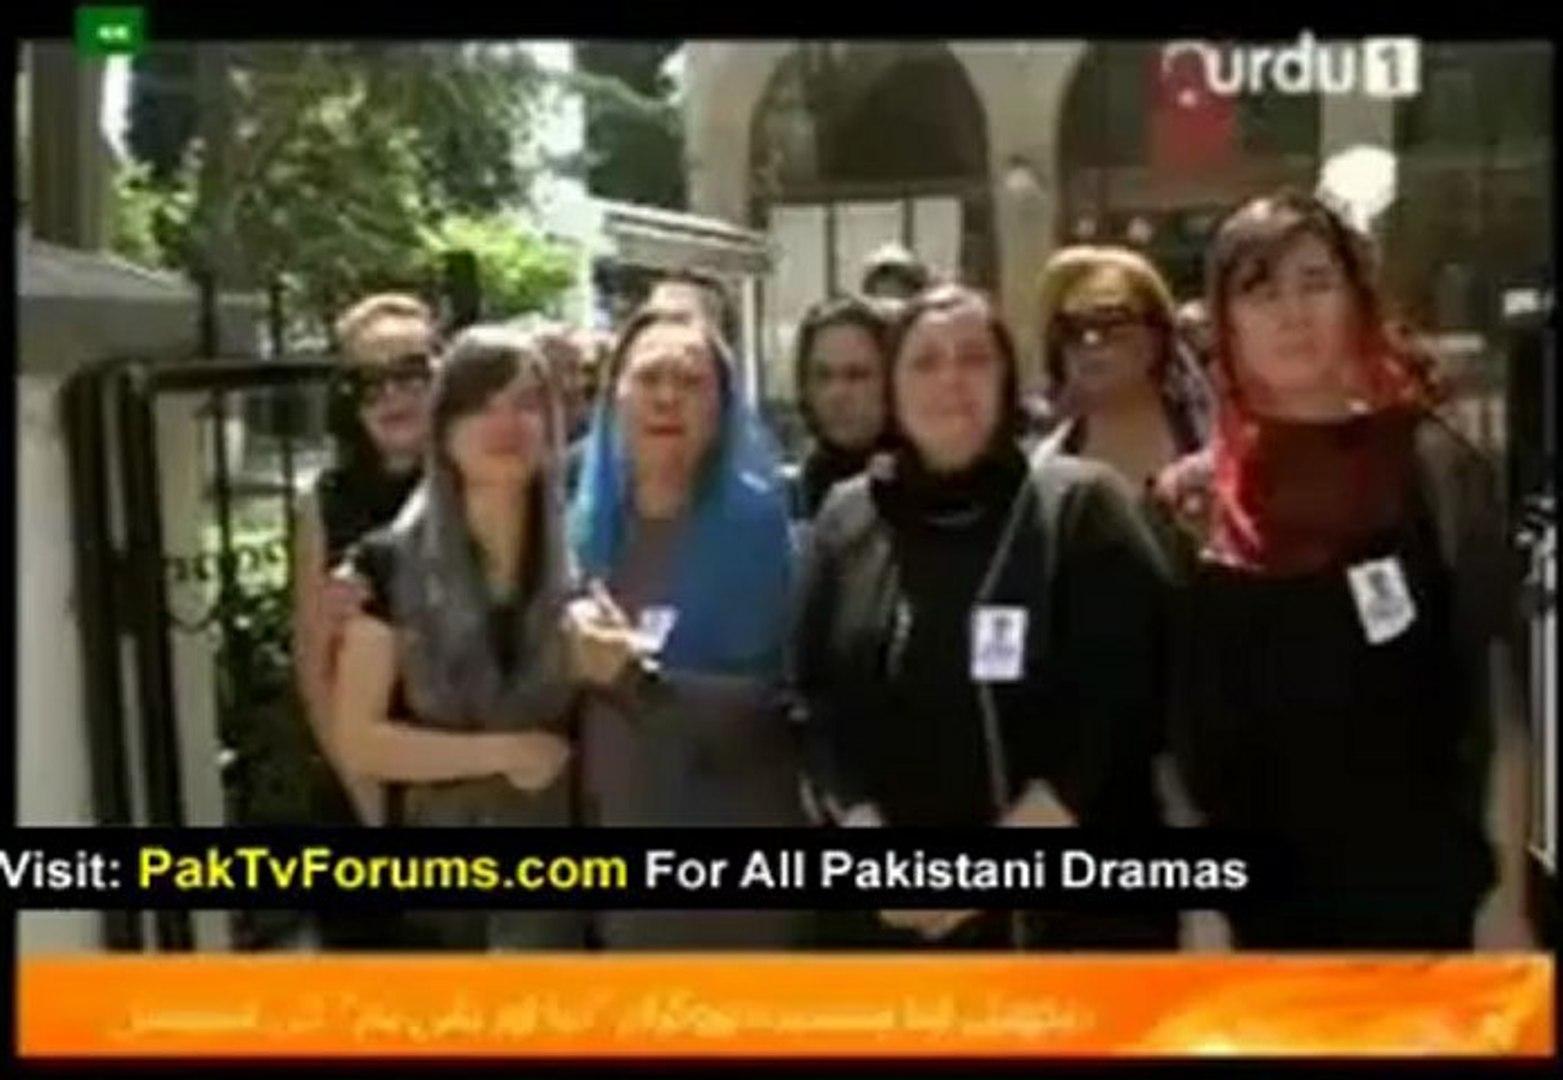 Ishq Mamnu by Urdu 1 - LAST Episode 164 - Part 3/4